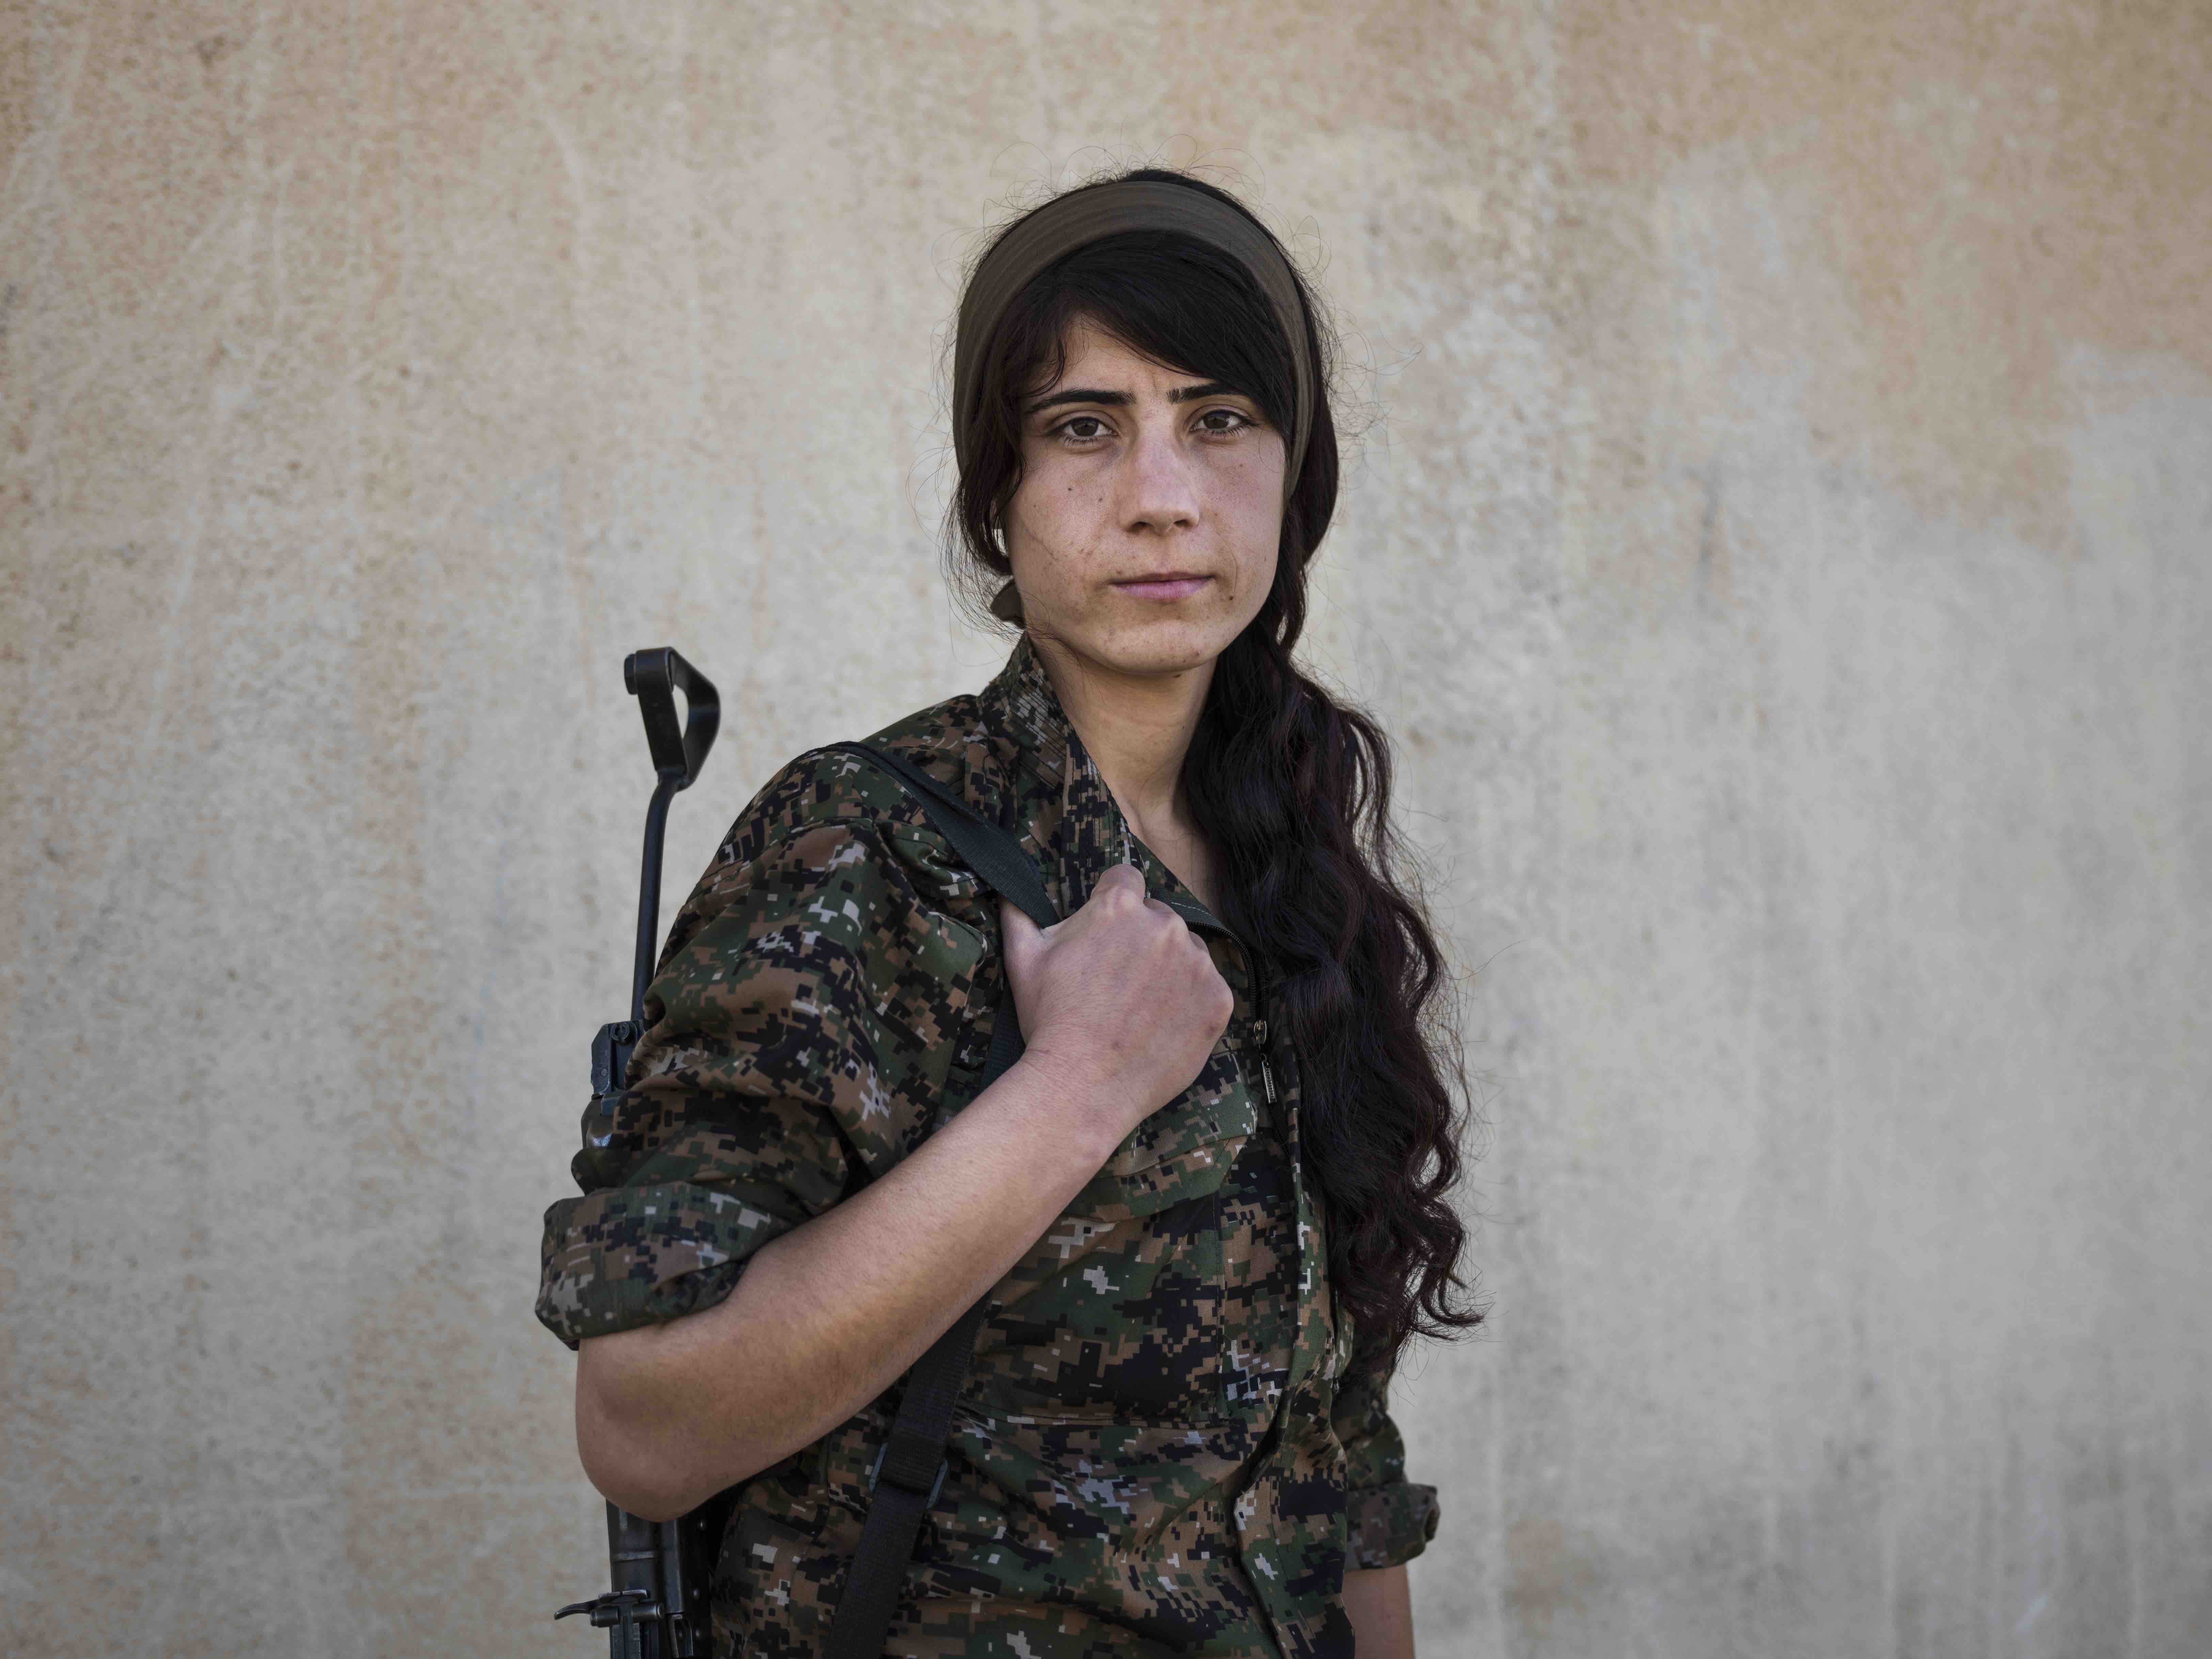 Rojava Suzdar, 21, photographed in Serikani, Syria by Newsha Tavakolian